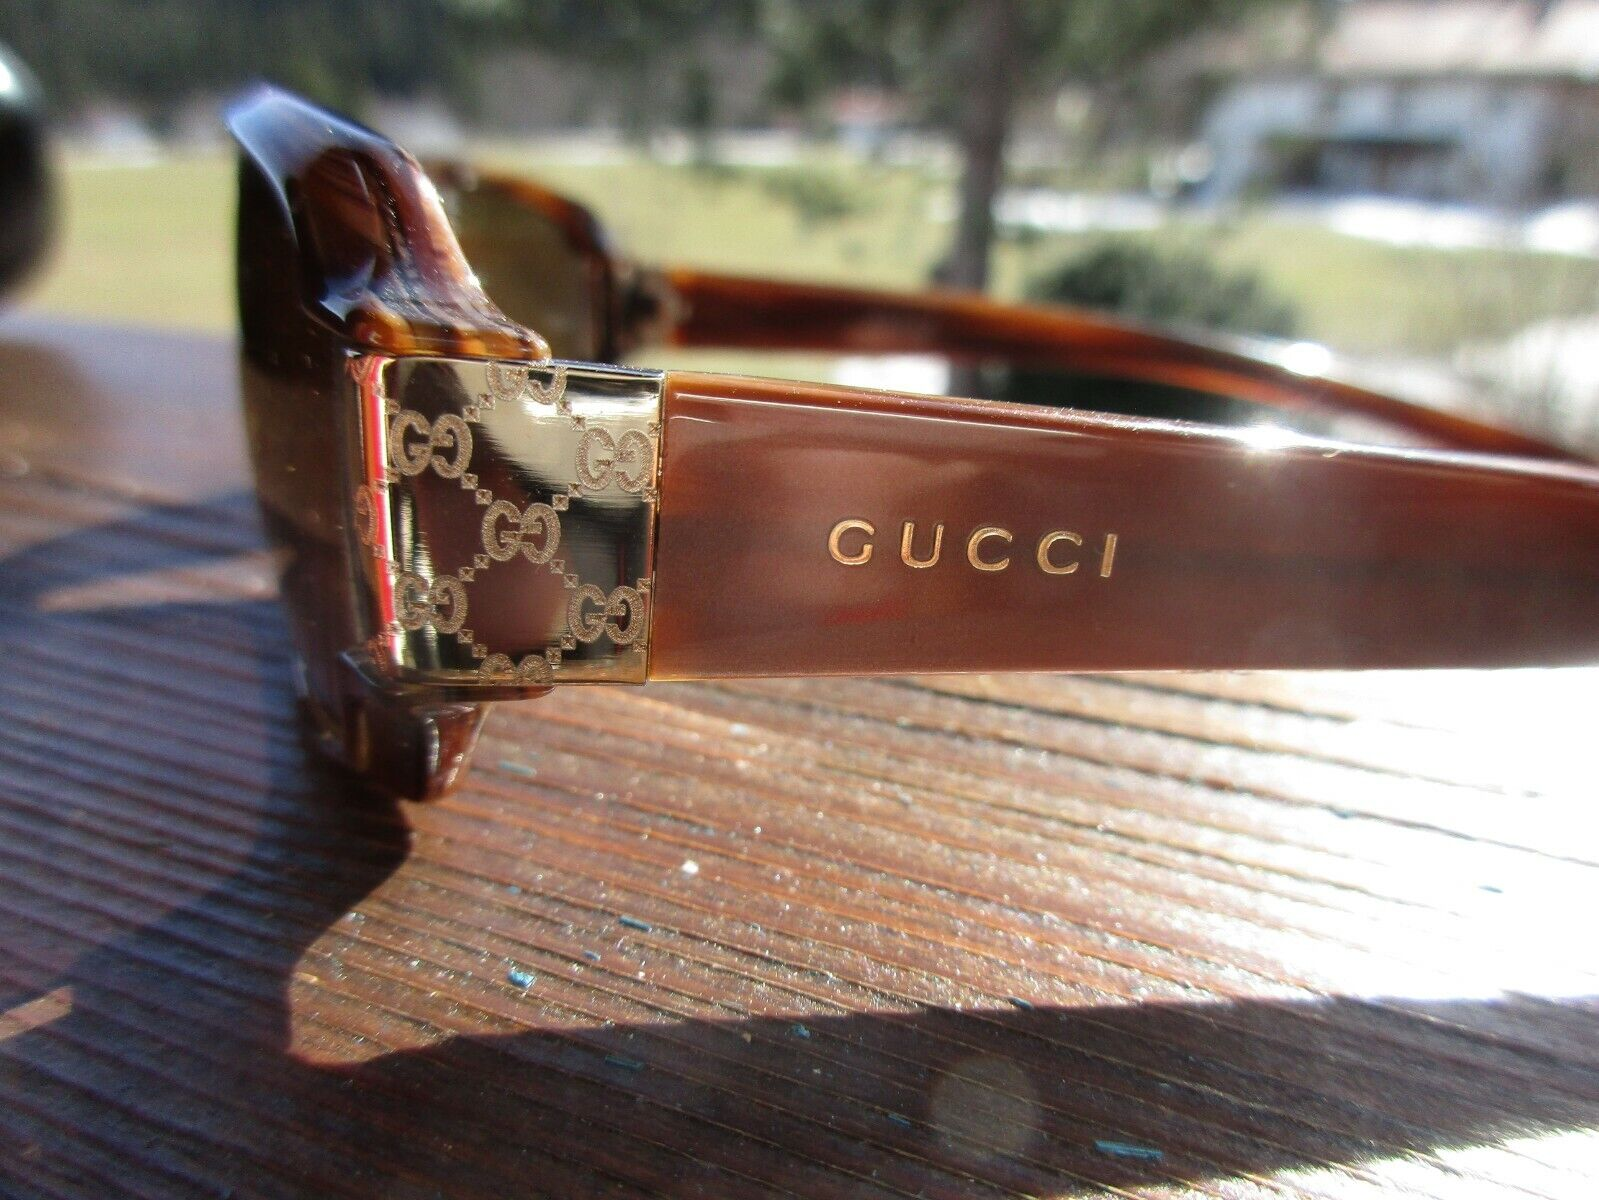 Schöne Gucci Sonnenbrille, GUCCI, Etui, Damen, Reduziert